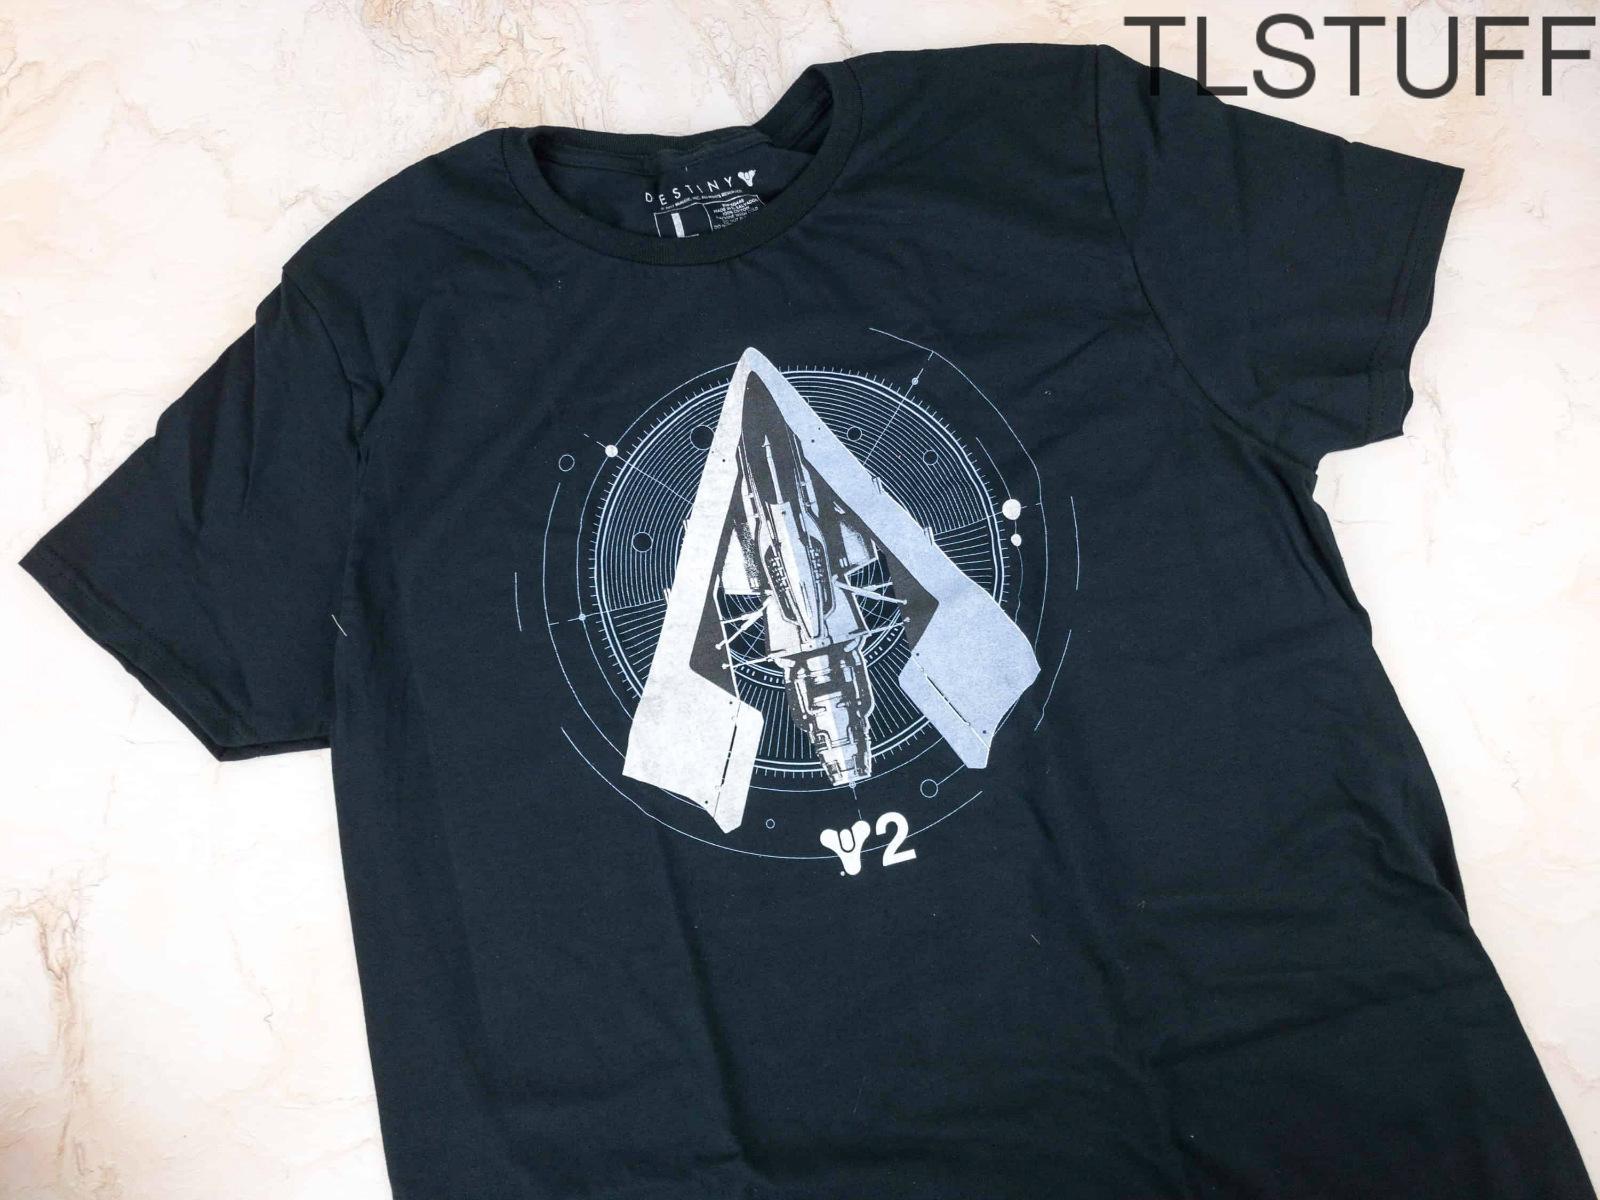 Loot Crate Destiny 2 T-Shirt December 2017 2XL XXL